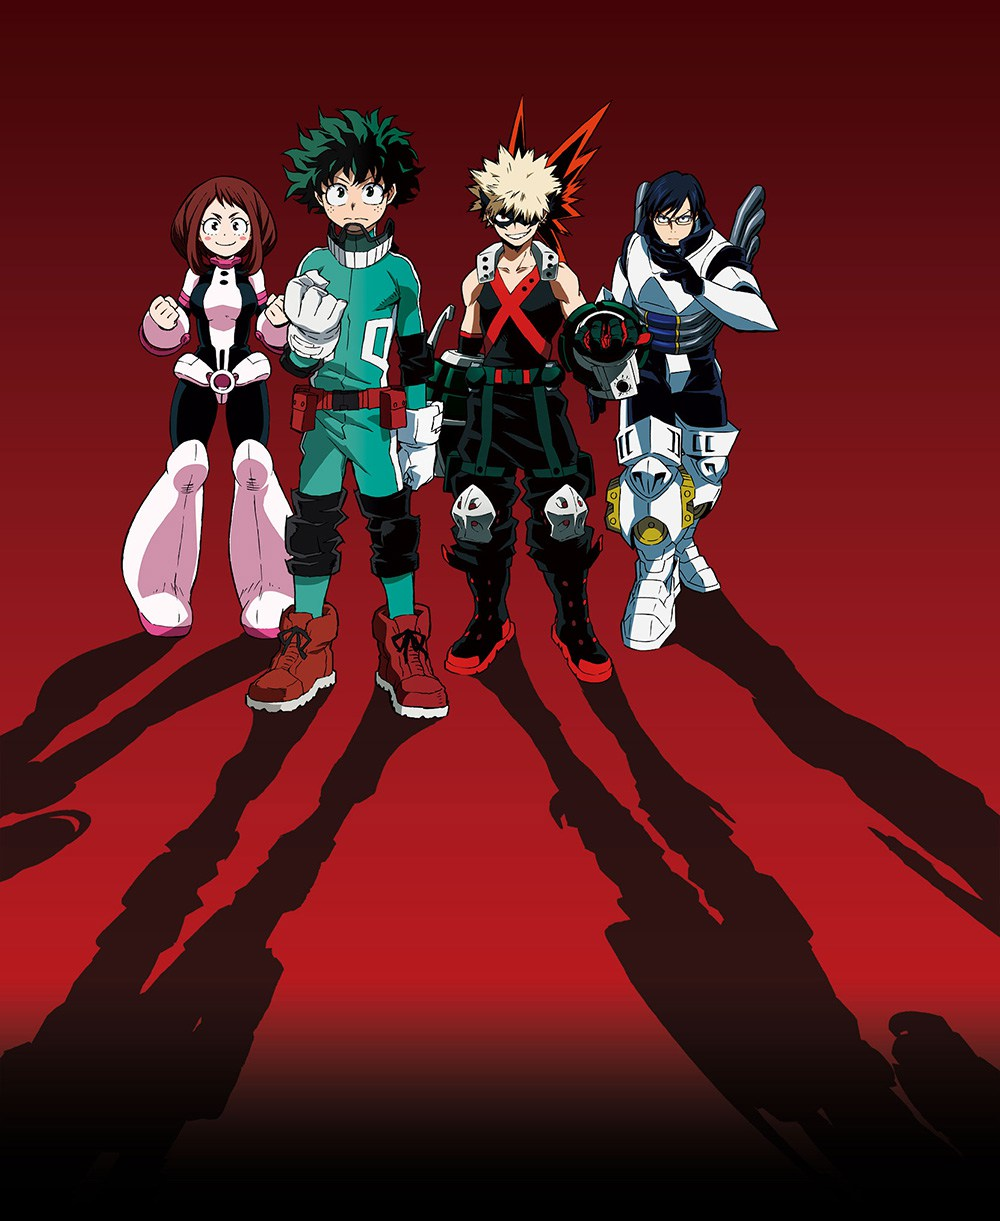 Boku-no-Hero-Academia-Anime-Visual-02